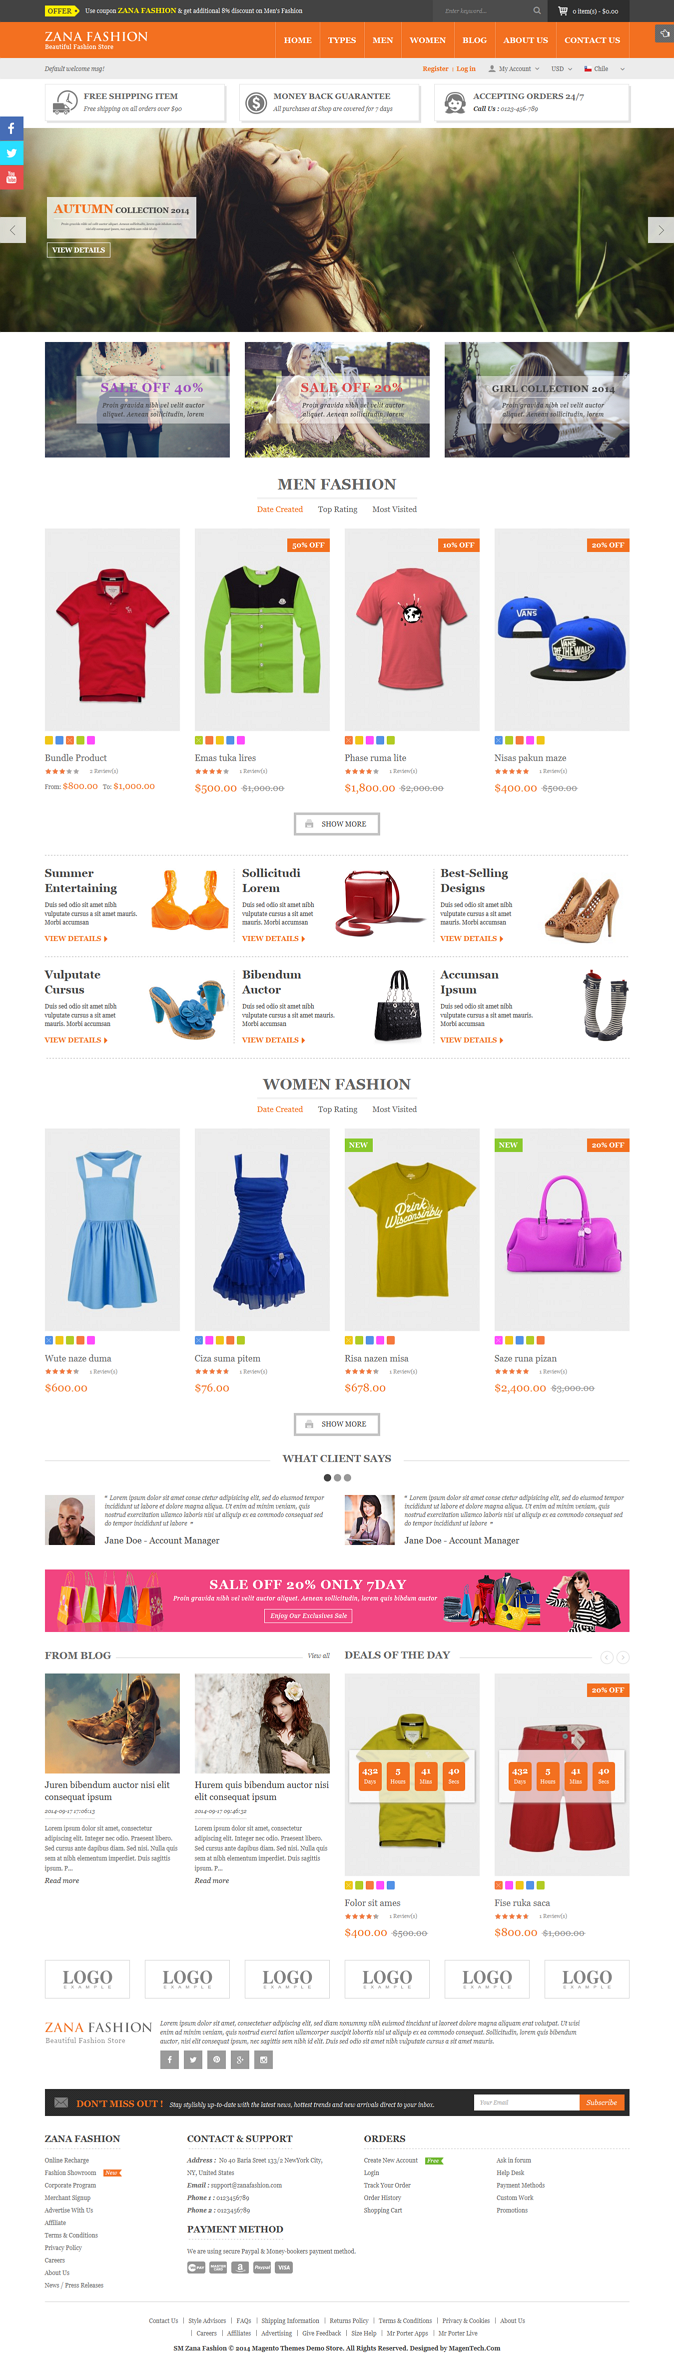 Zana Premium Responsive Magento Fashion Theme